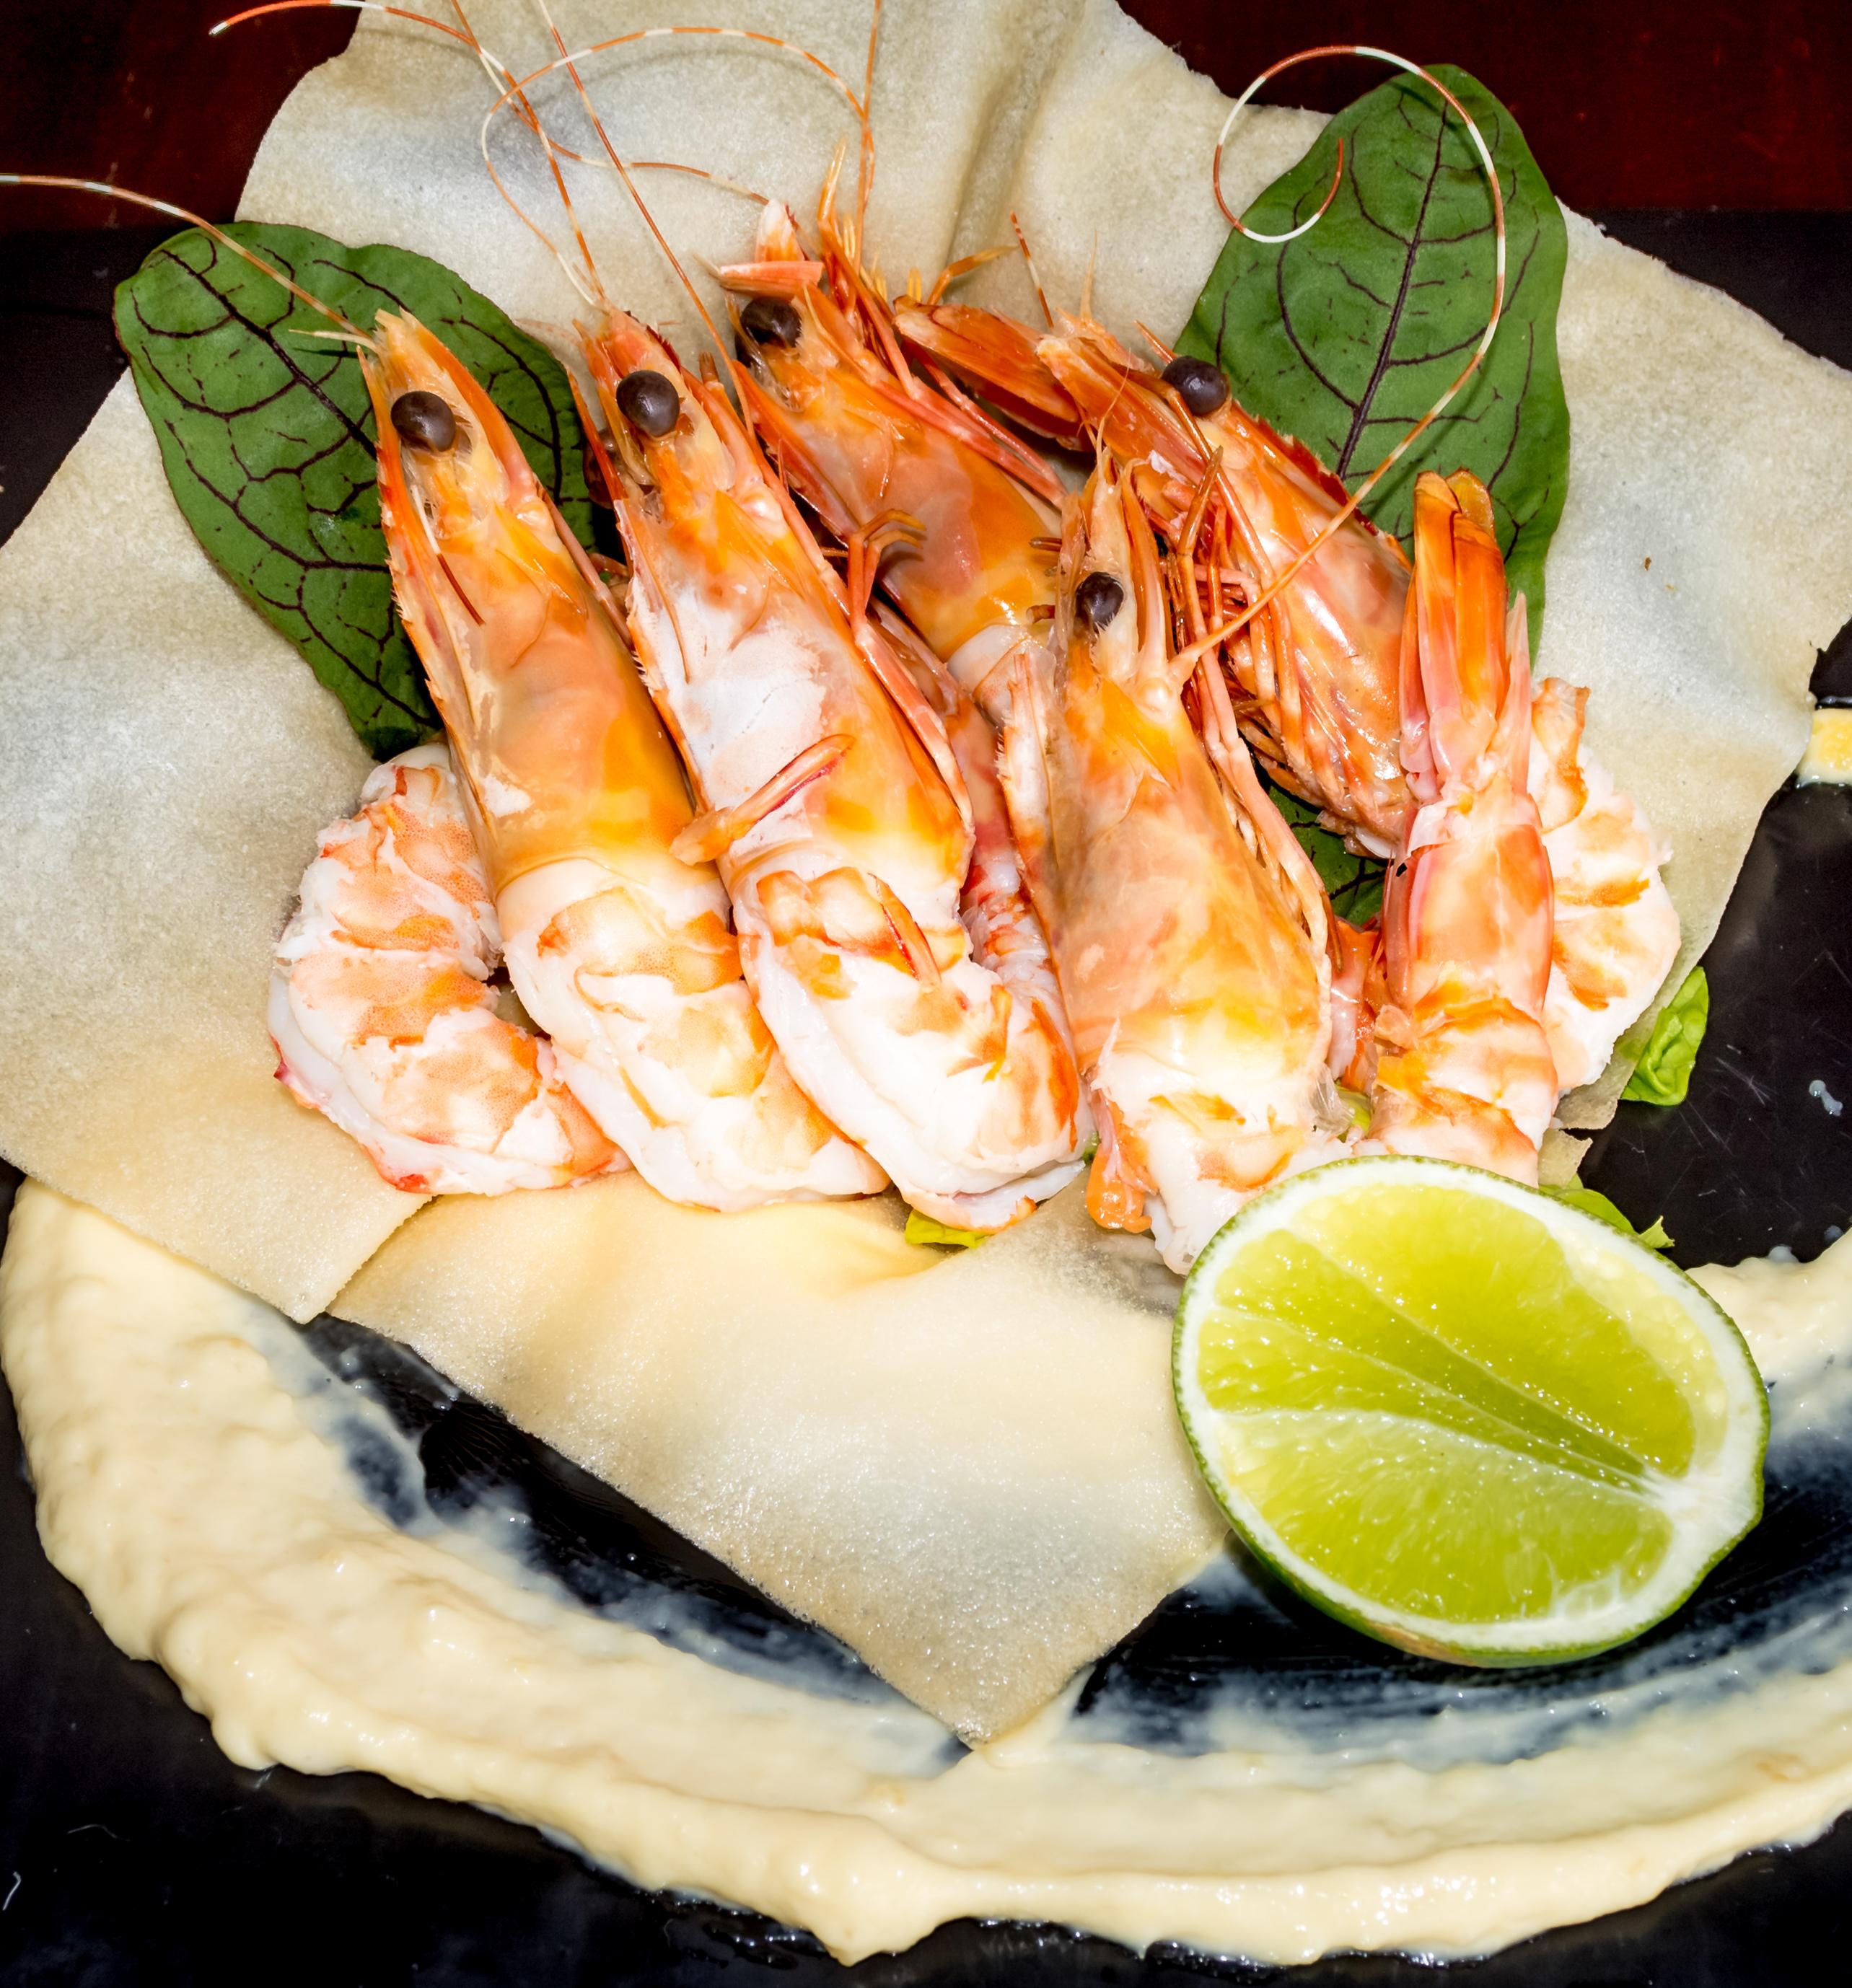 https://www.thalabeach.com.au/wp-content/uploads/2018/01/Ospreys-Restaurant-lunch-7.jpg